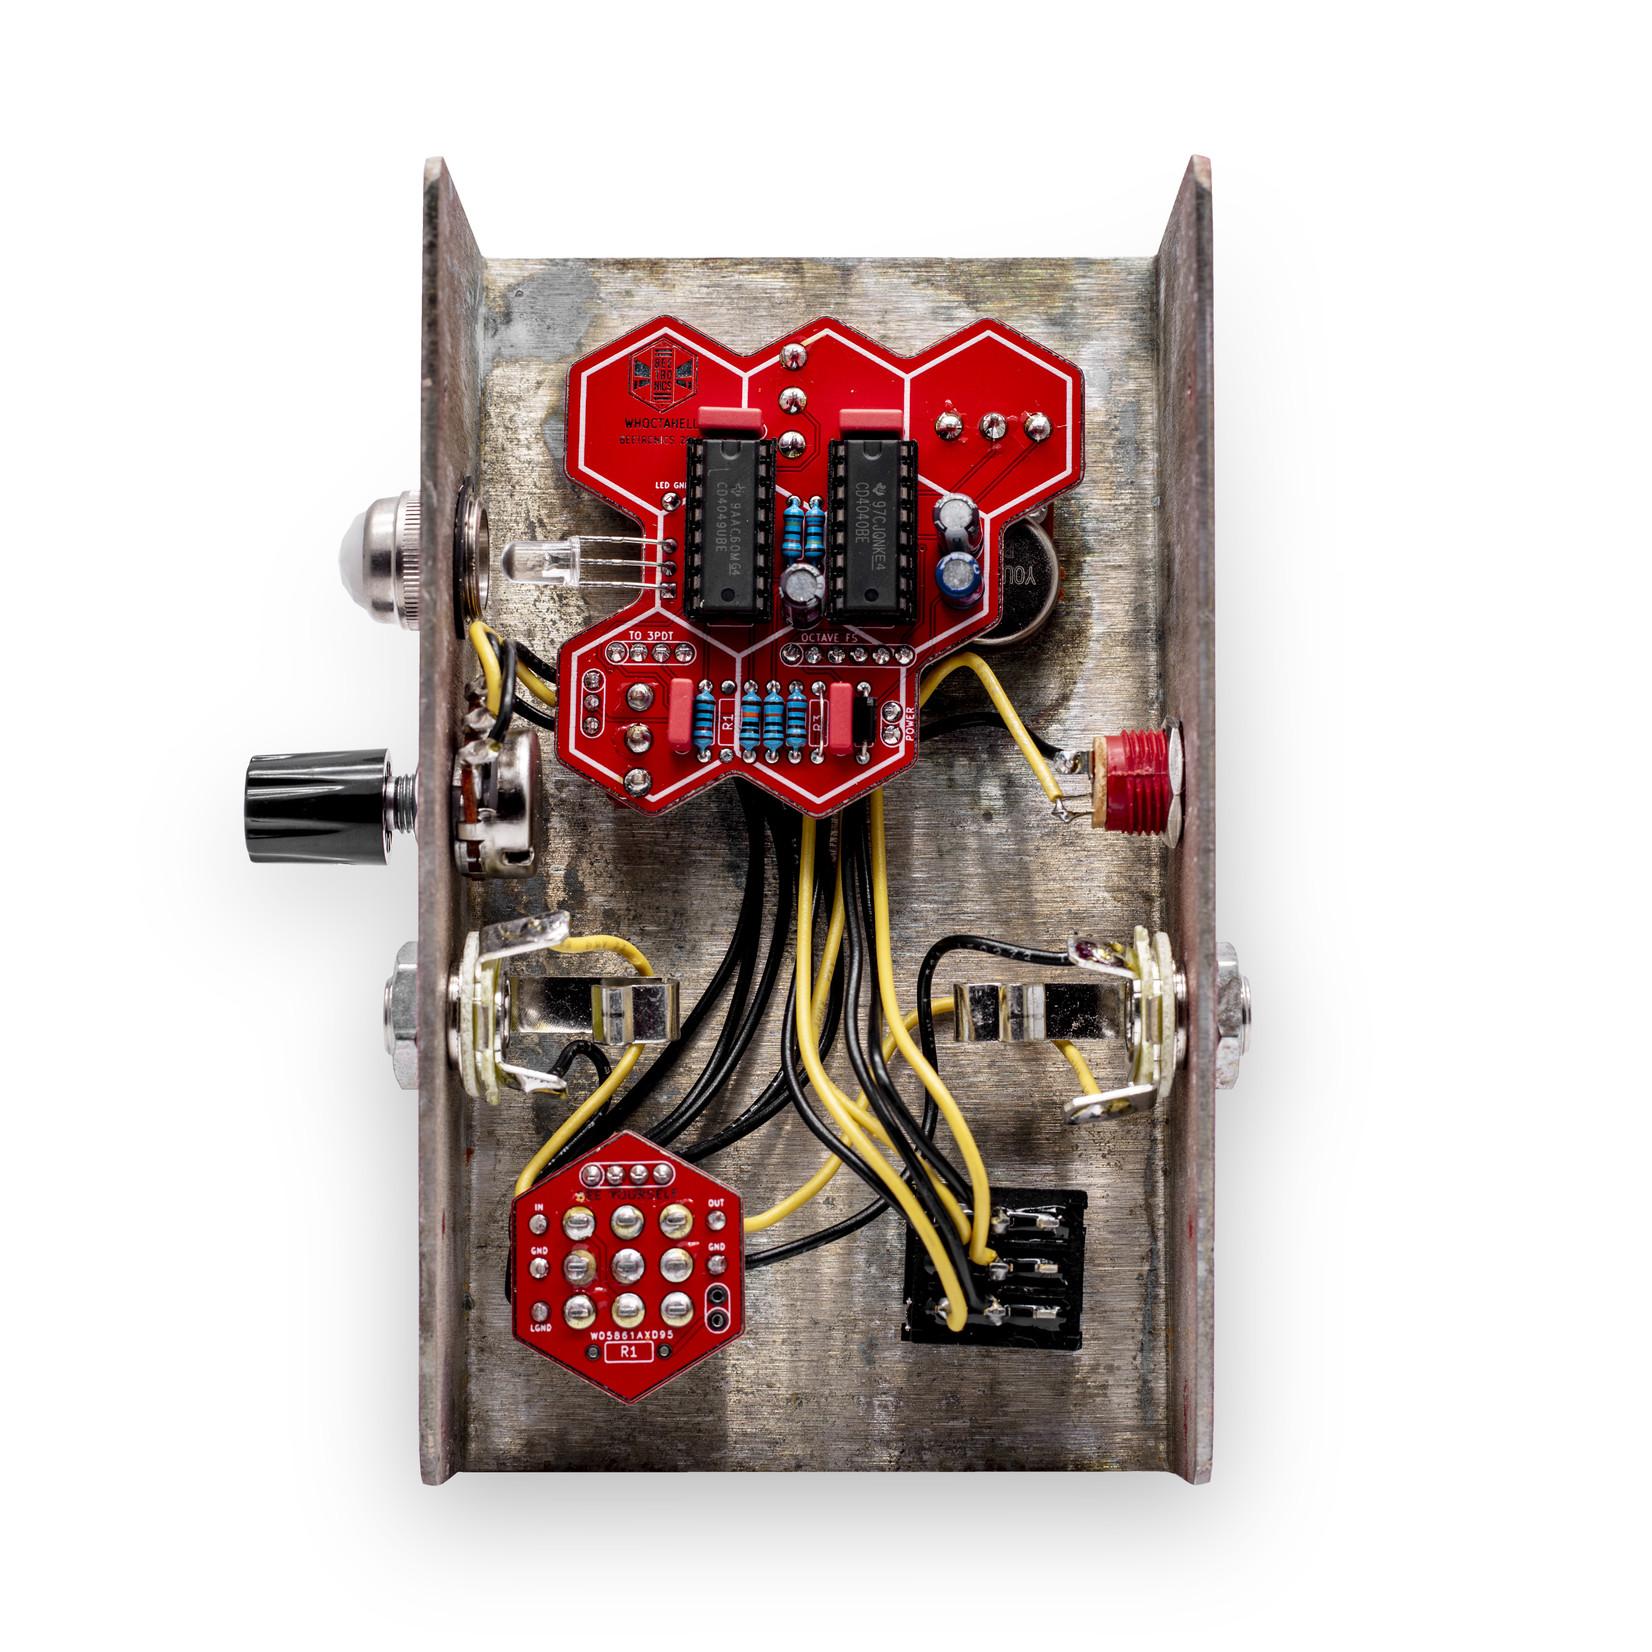 Beetronics Beetronics Whoctahell Low Octave Fuzz, overdrive / fuzz with optional octaver